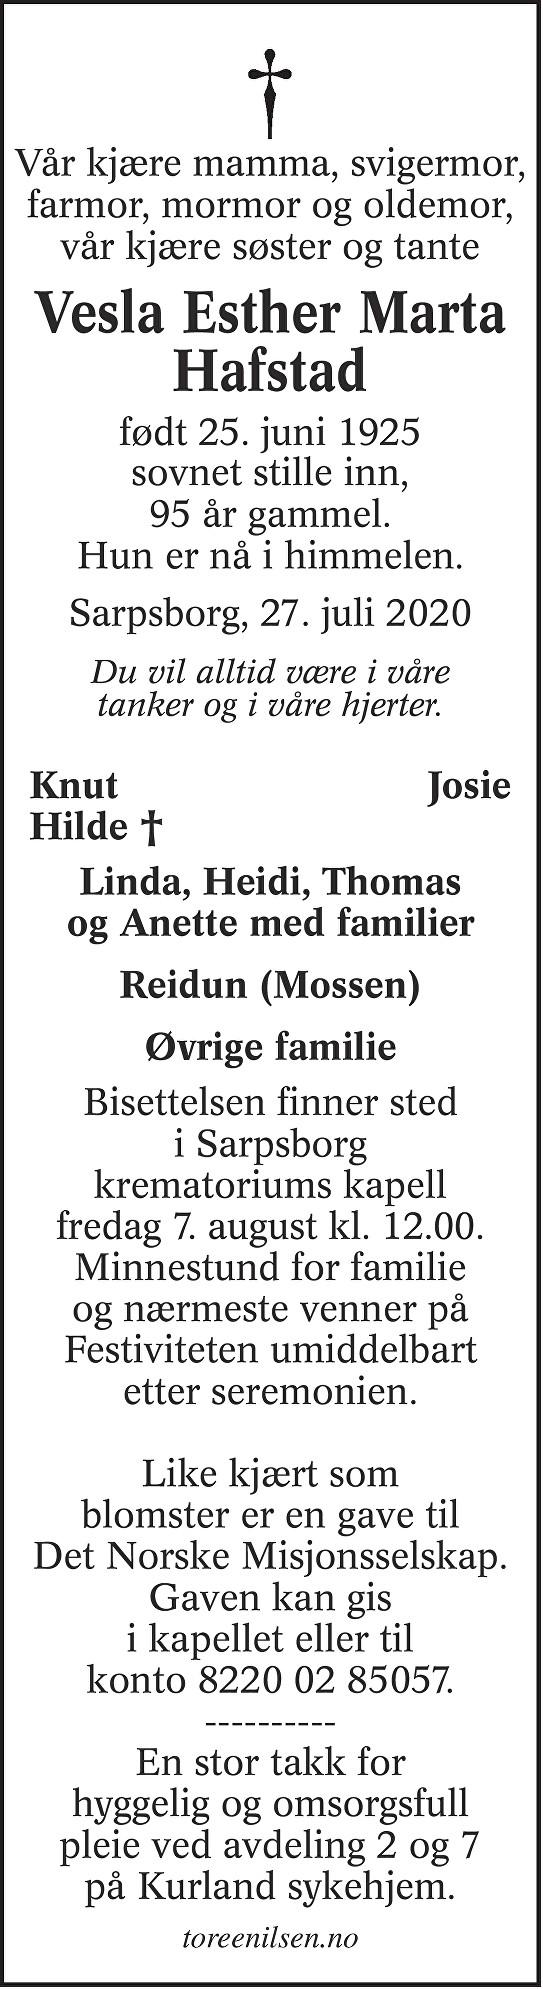 Vesla Esther Marta Hafstad Dødsannonse